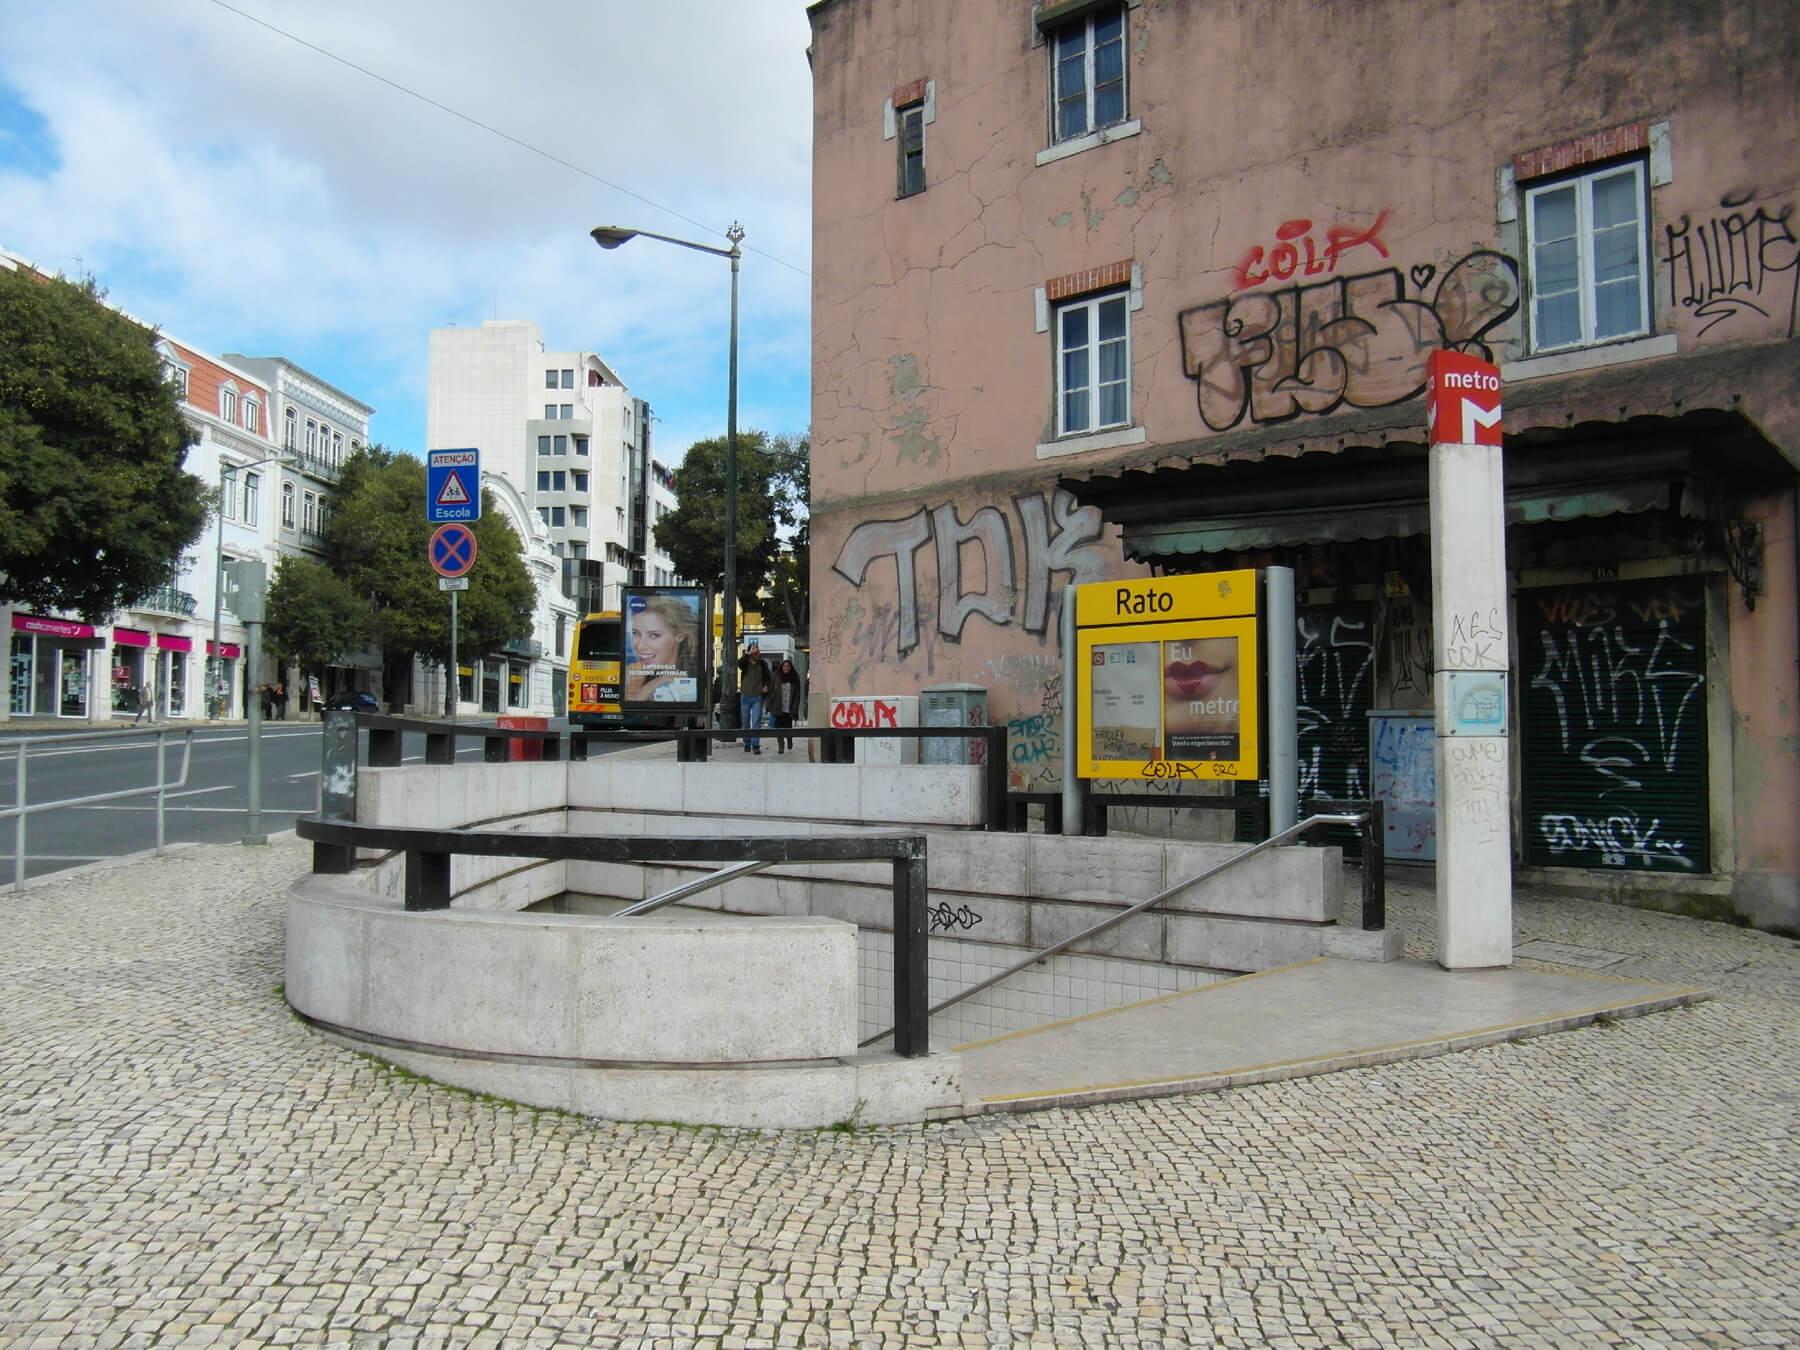 Спуск в метро Rato